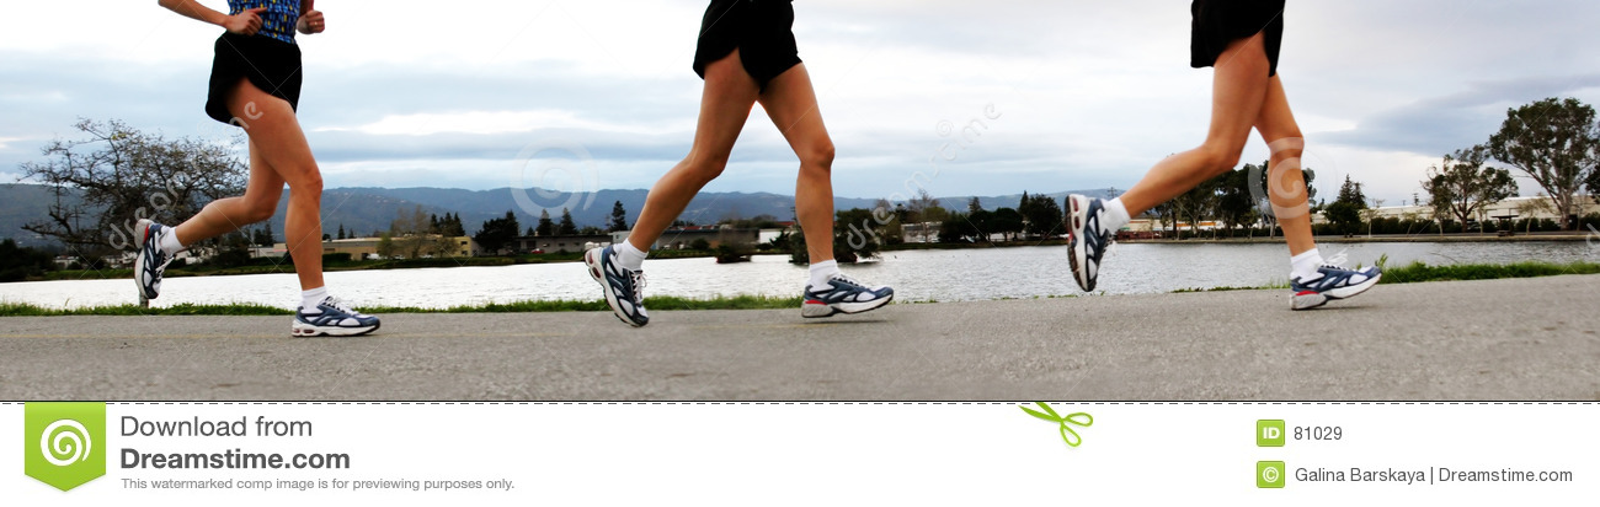 Mulheres Running